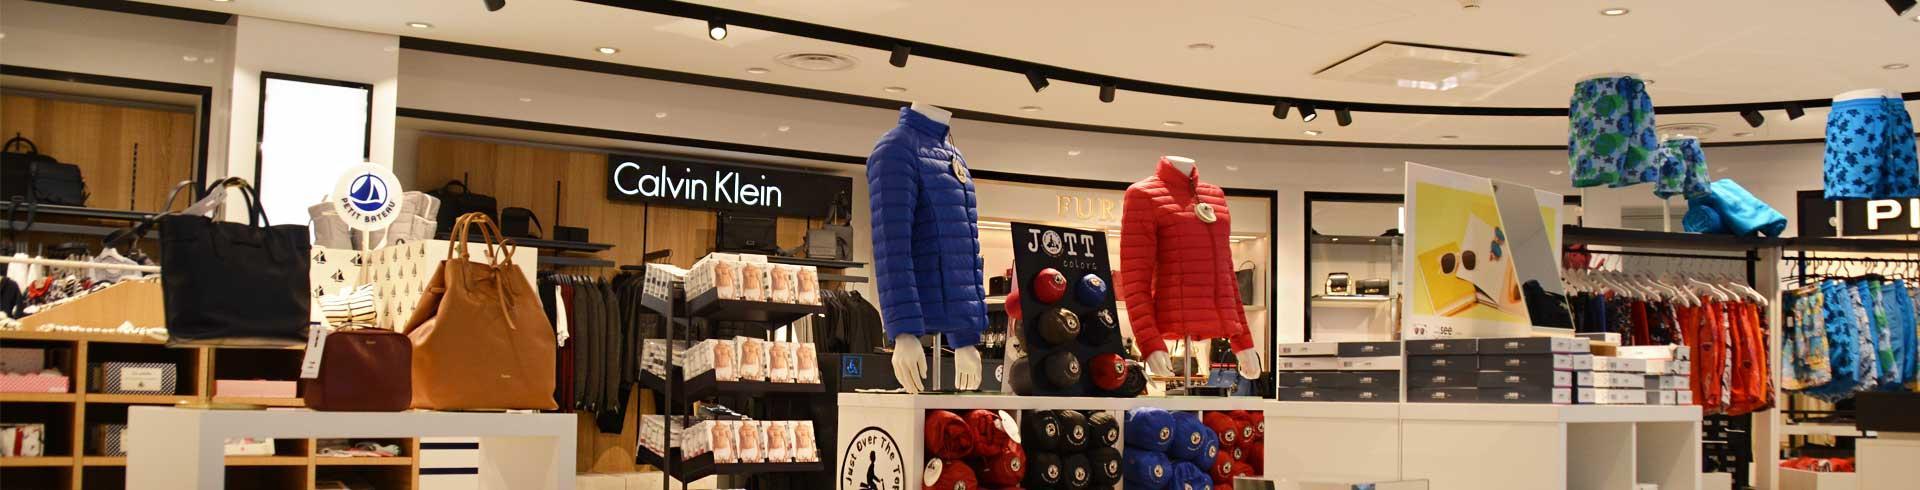 b4707df2f6 Luxury Fashion Multibrand store   Mode   Accessoires   Terminal 2 ...